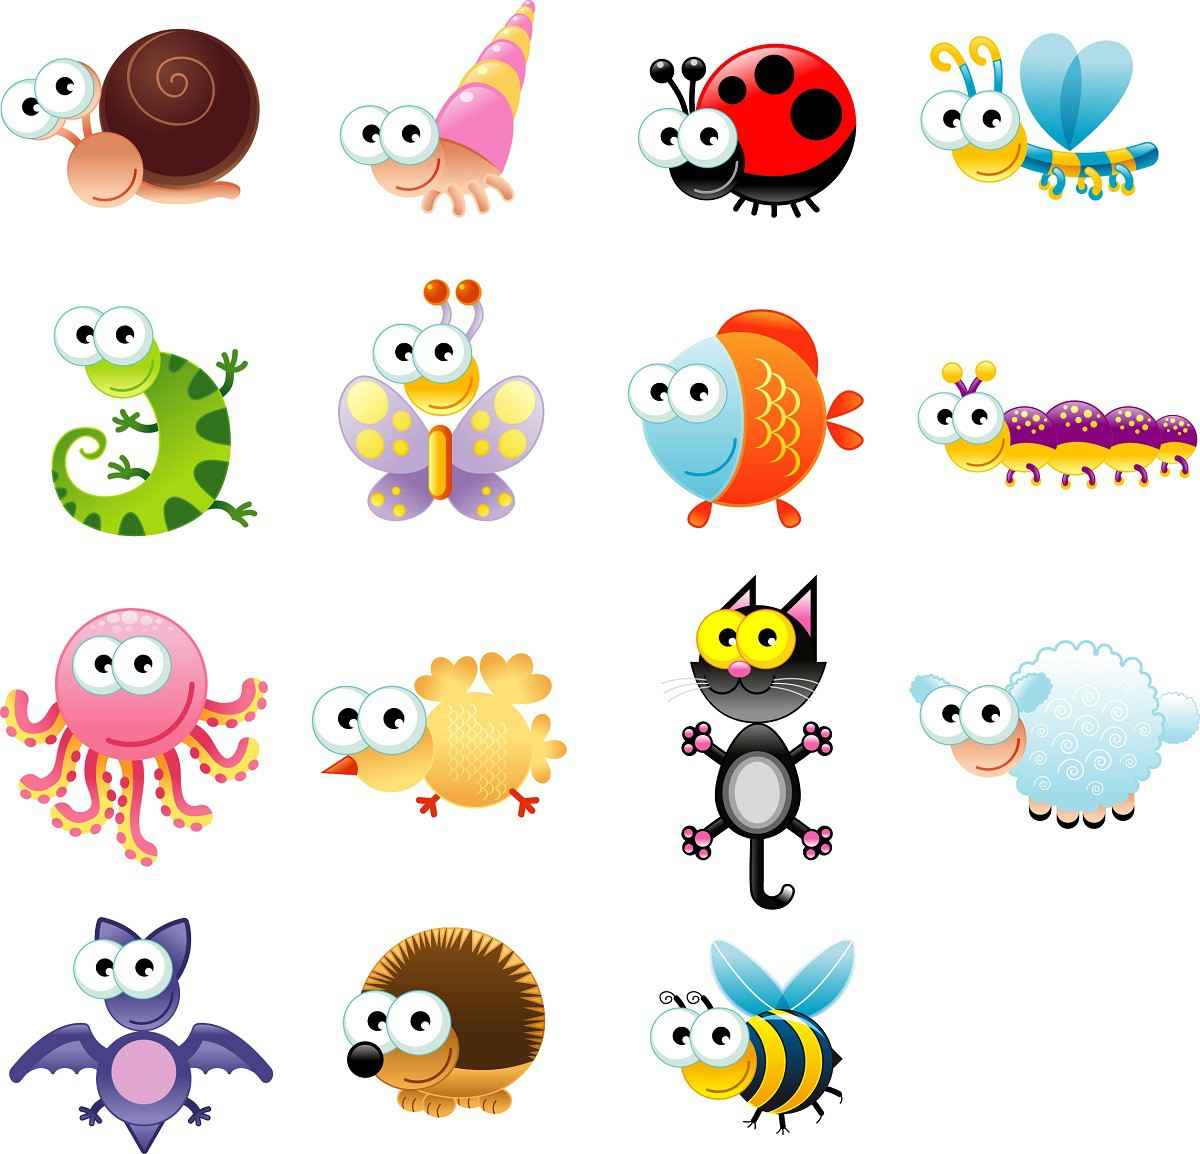 Cute Cartoon Animals 04 png